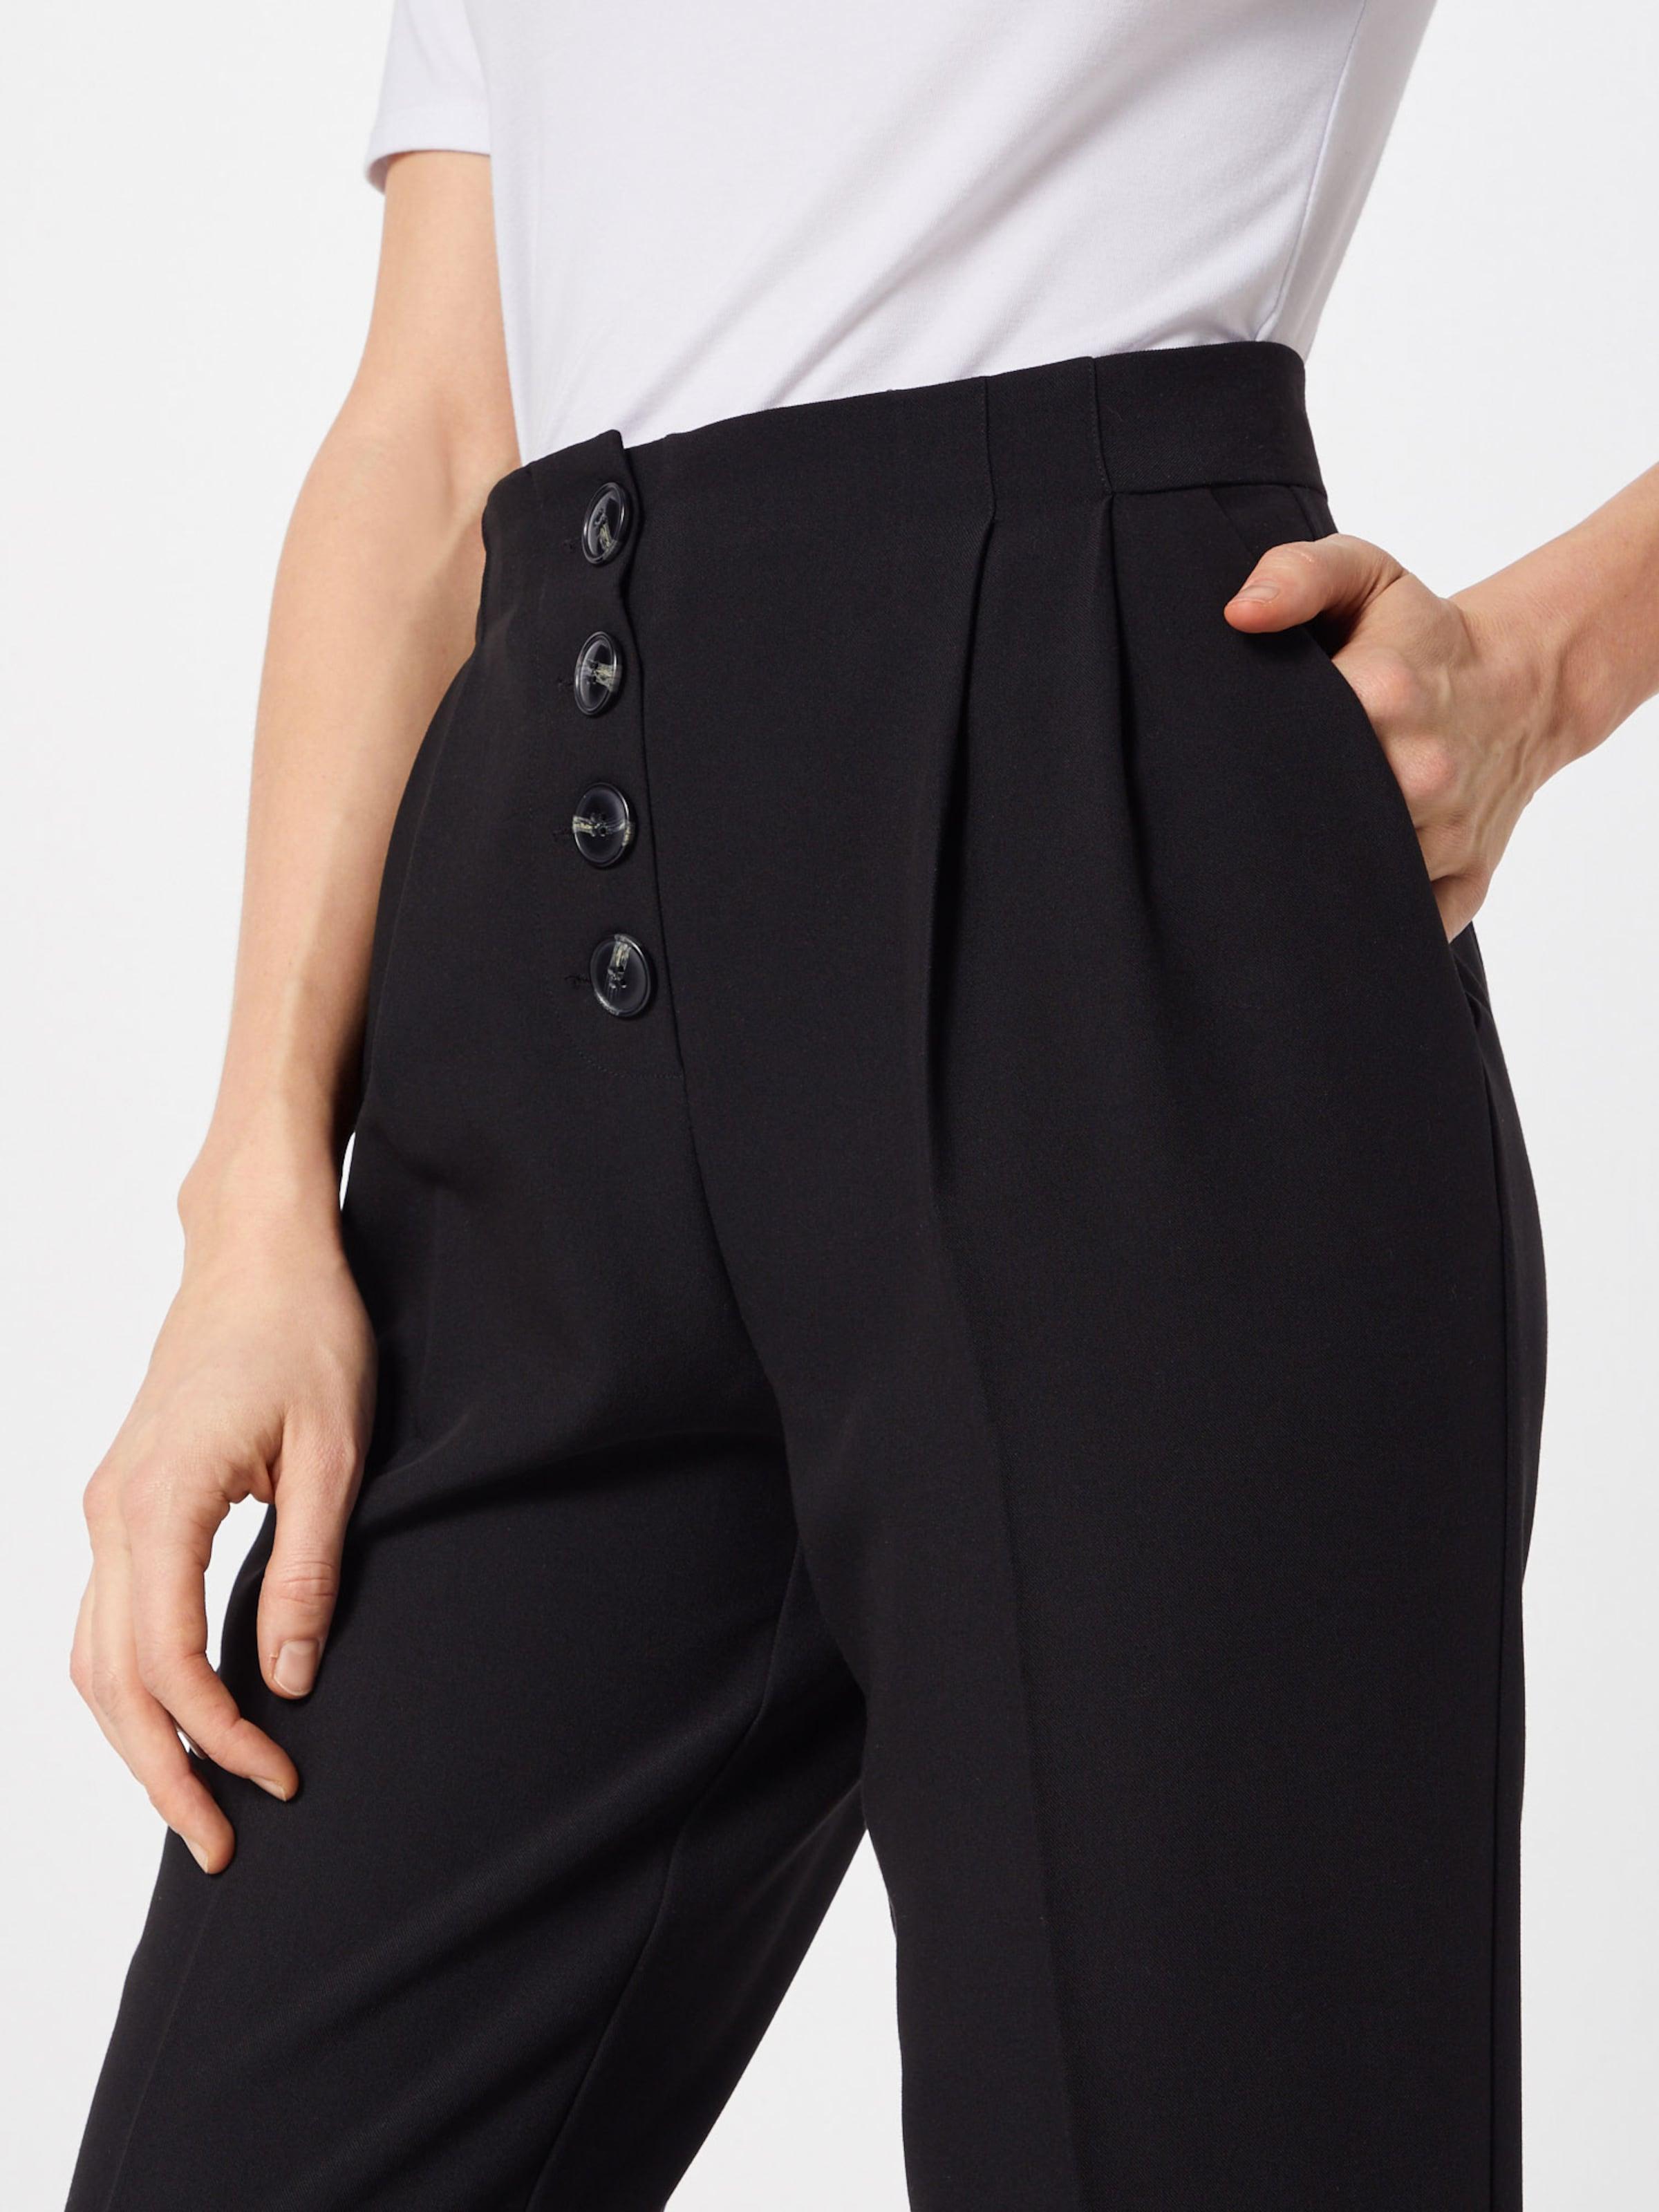 Noir En À Pantalon Pince 'onia' Pieces TJKc31lFu